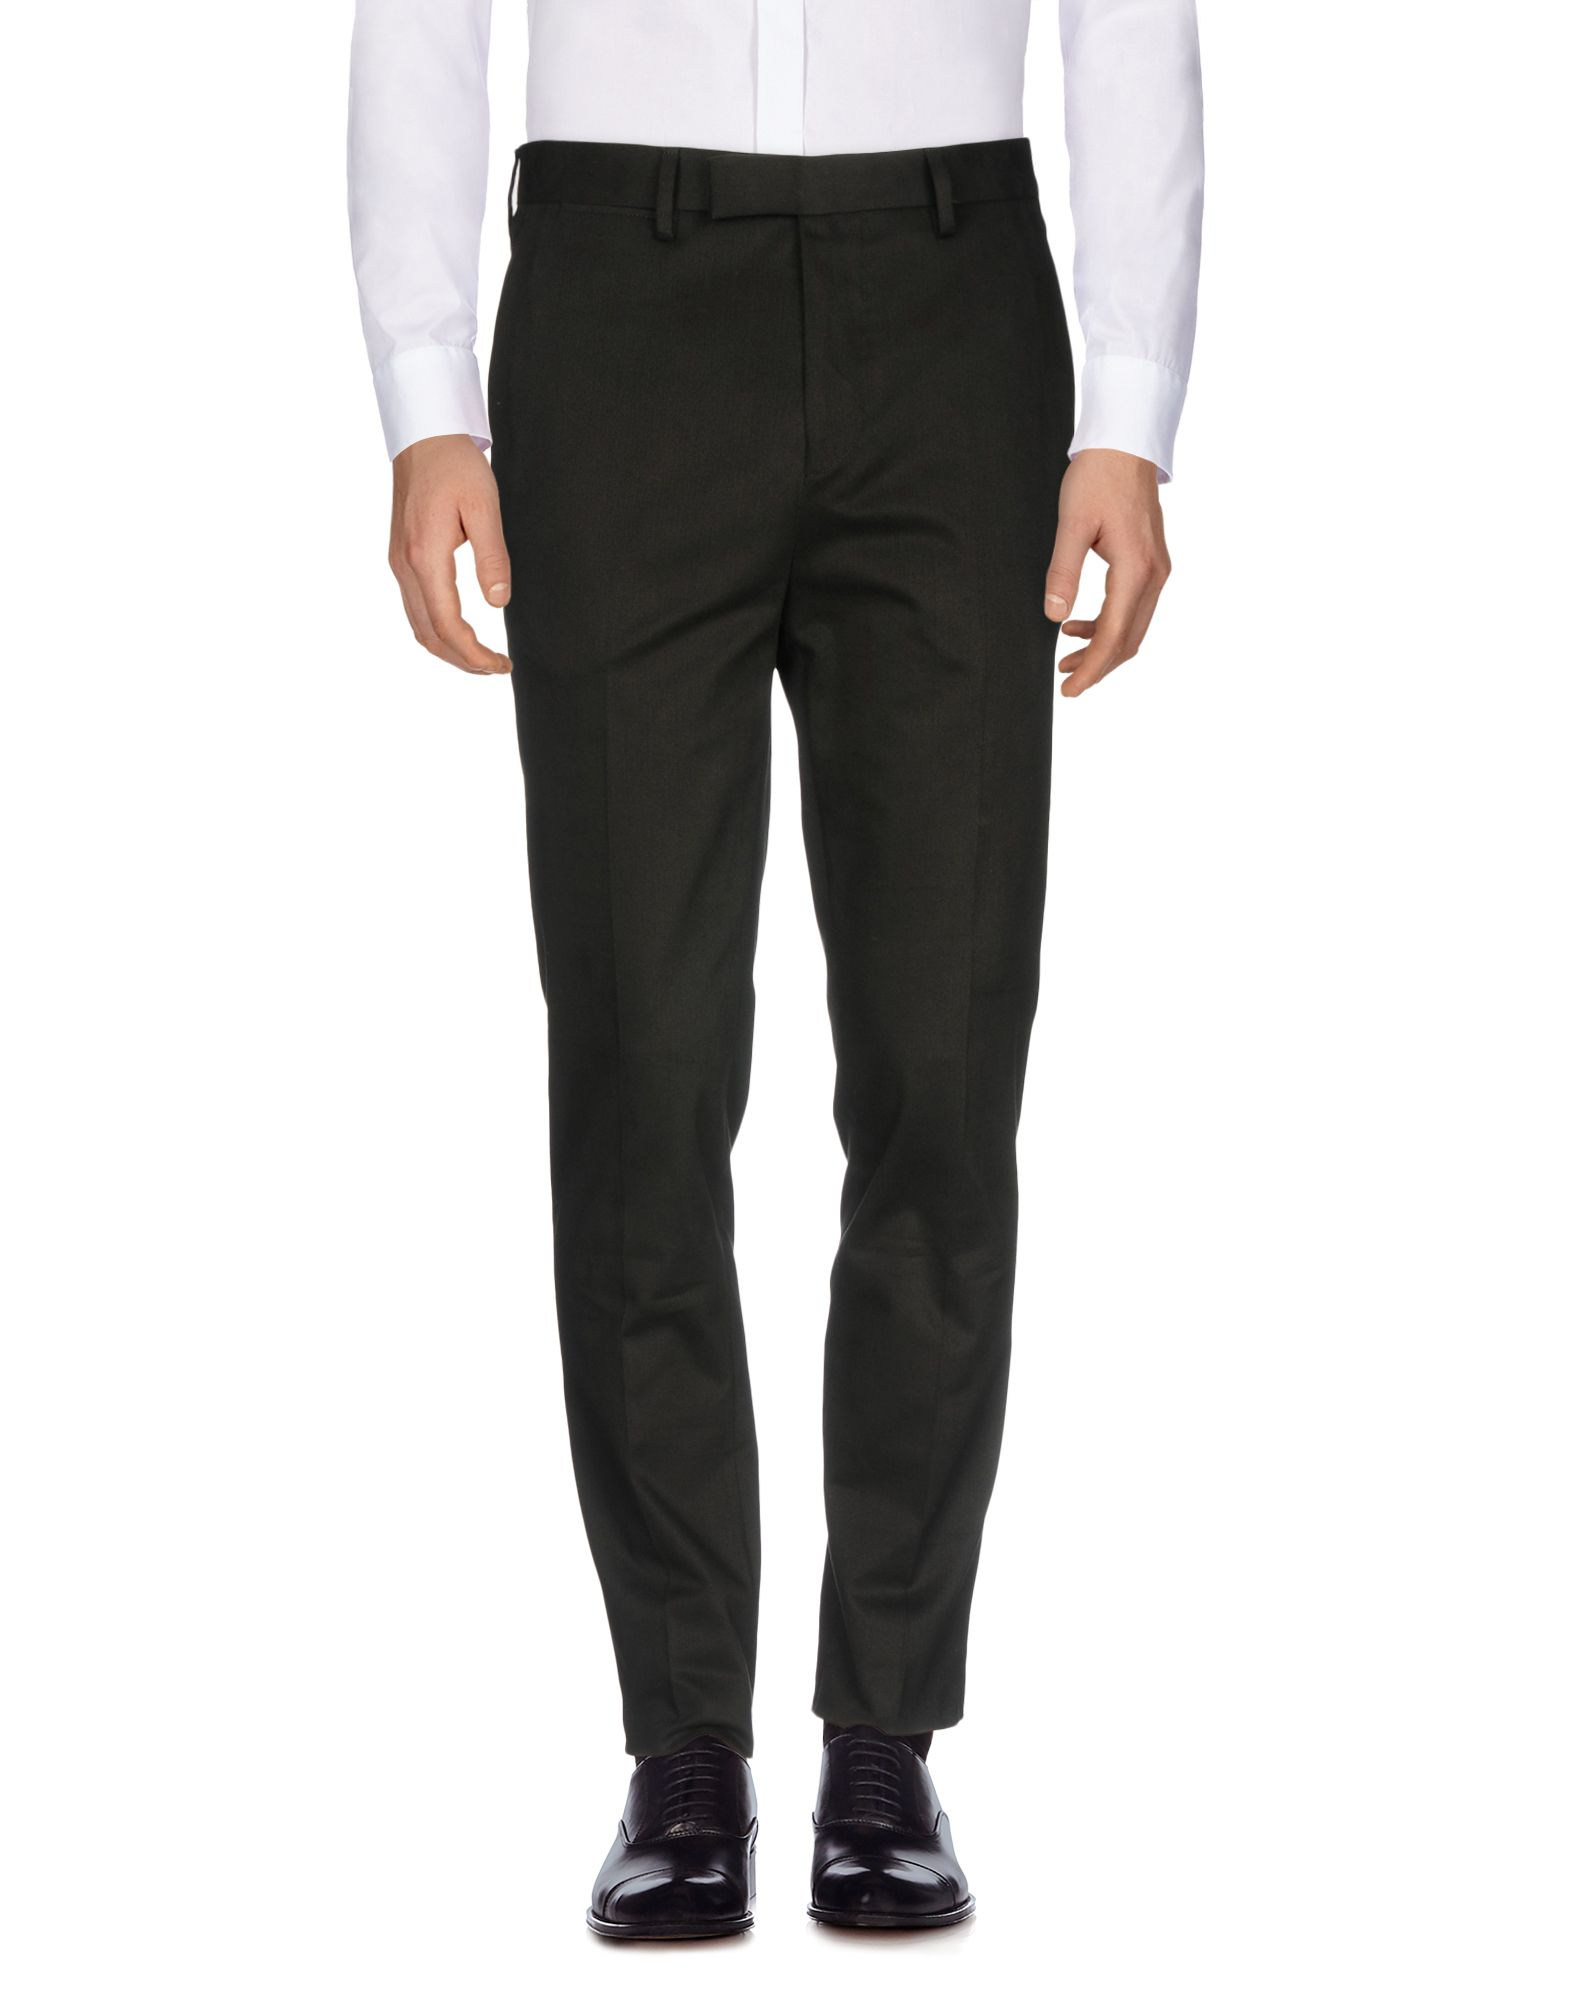 Pantalone Pantalone Pantalone Brian Dales Uomo - 13186200JF f6e2ac